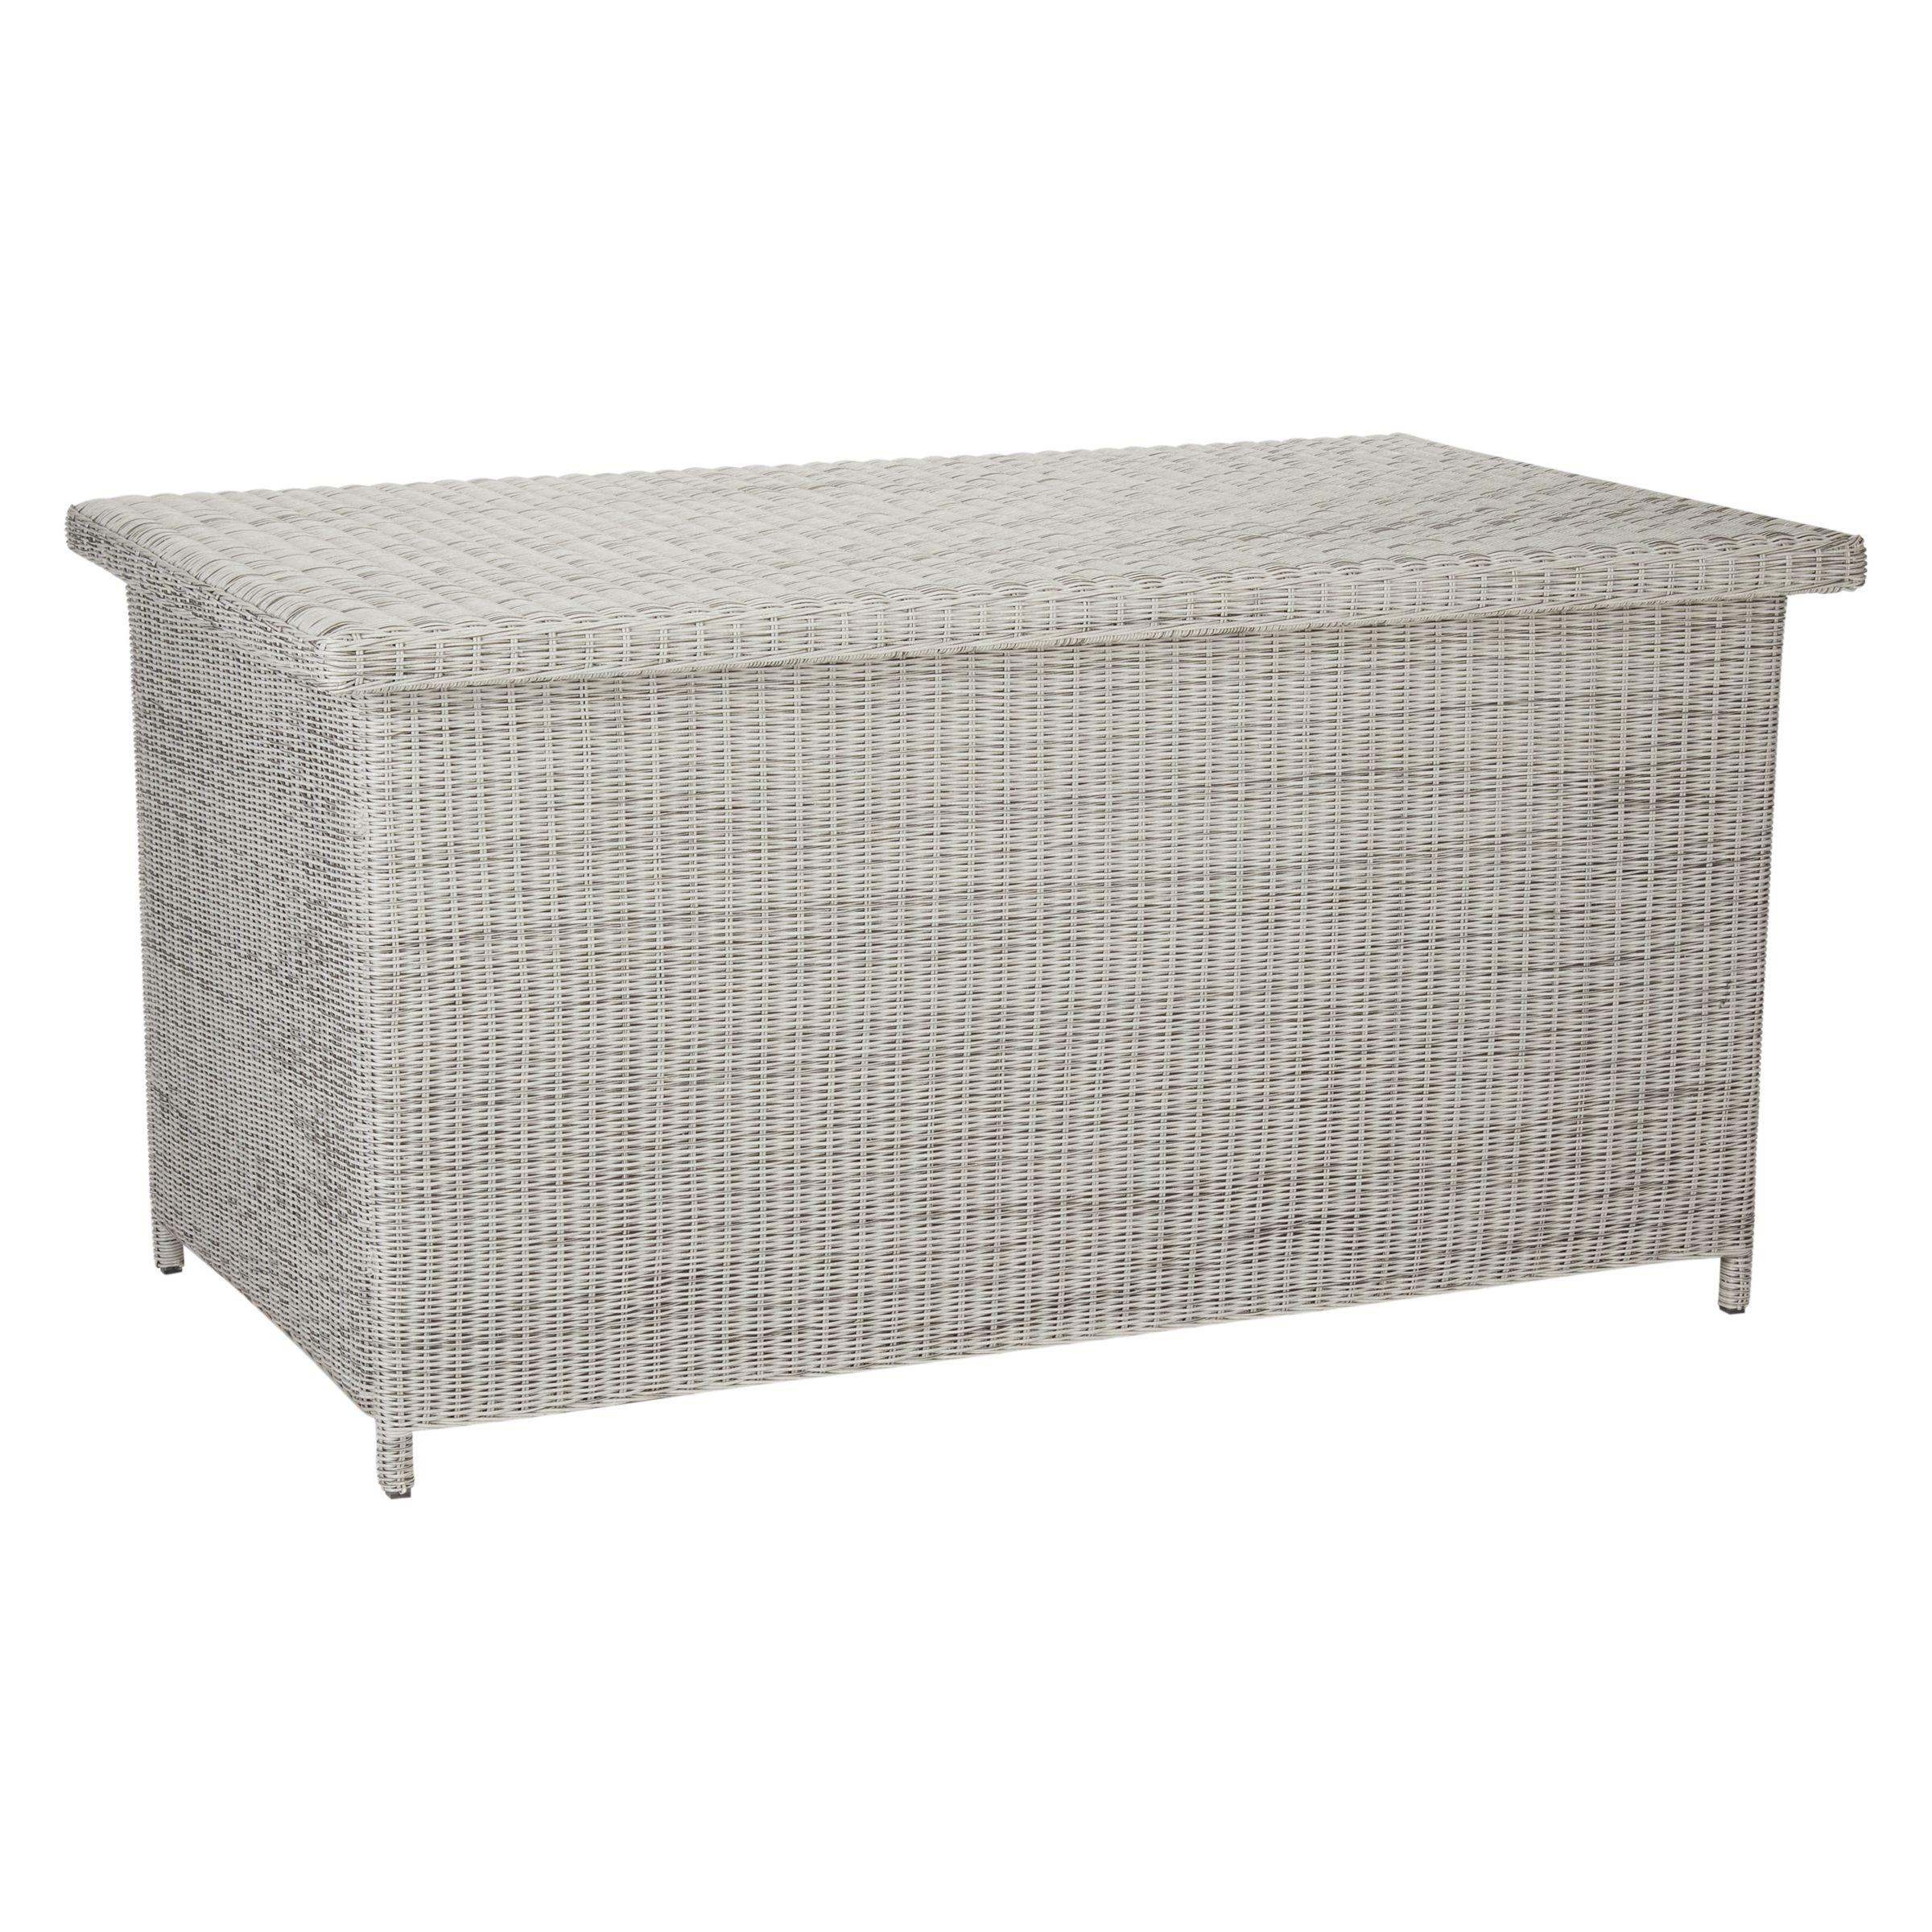 John Lewis Partners Dante Outdoor Cushion And Storage Box At John